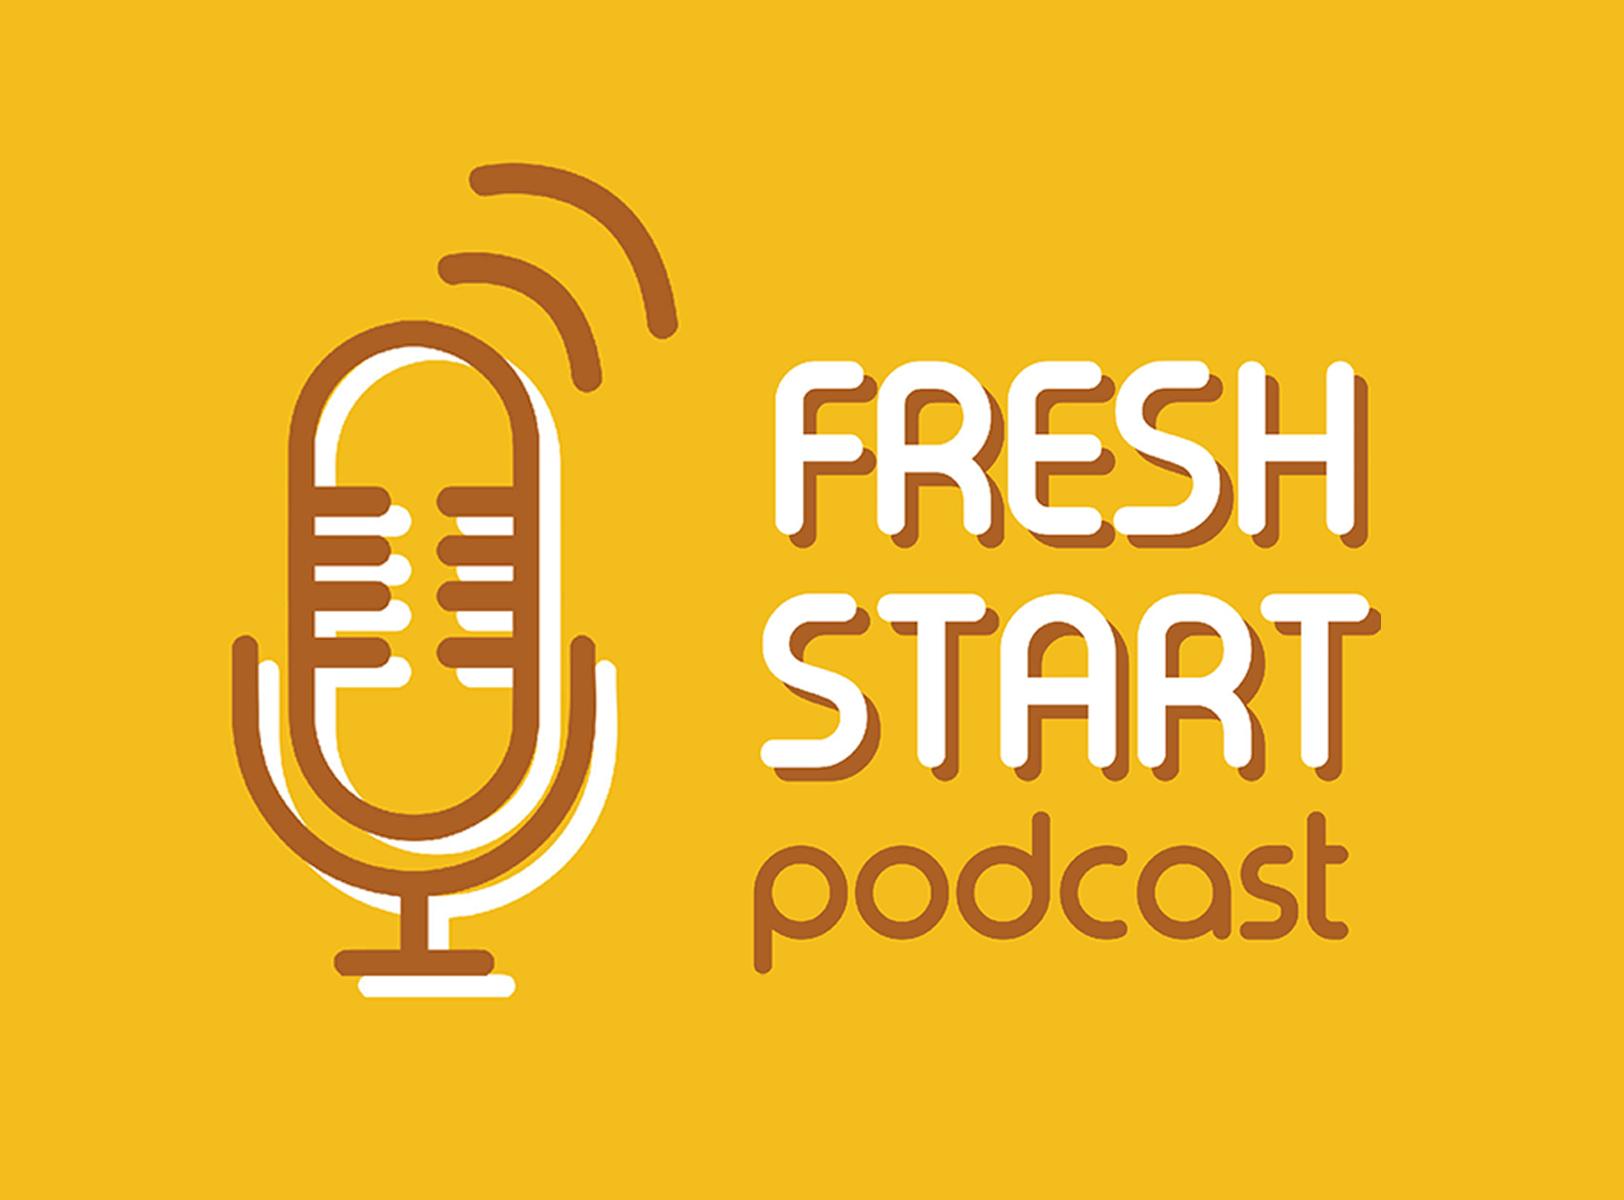 Fresh Start: Podcast News (4/4/2019 Thu.)